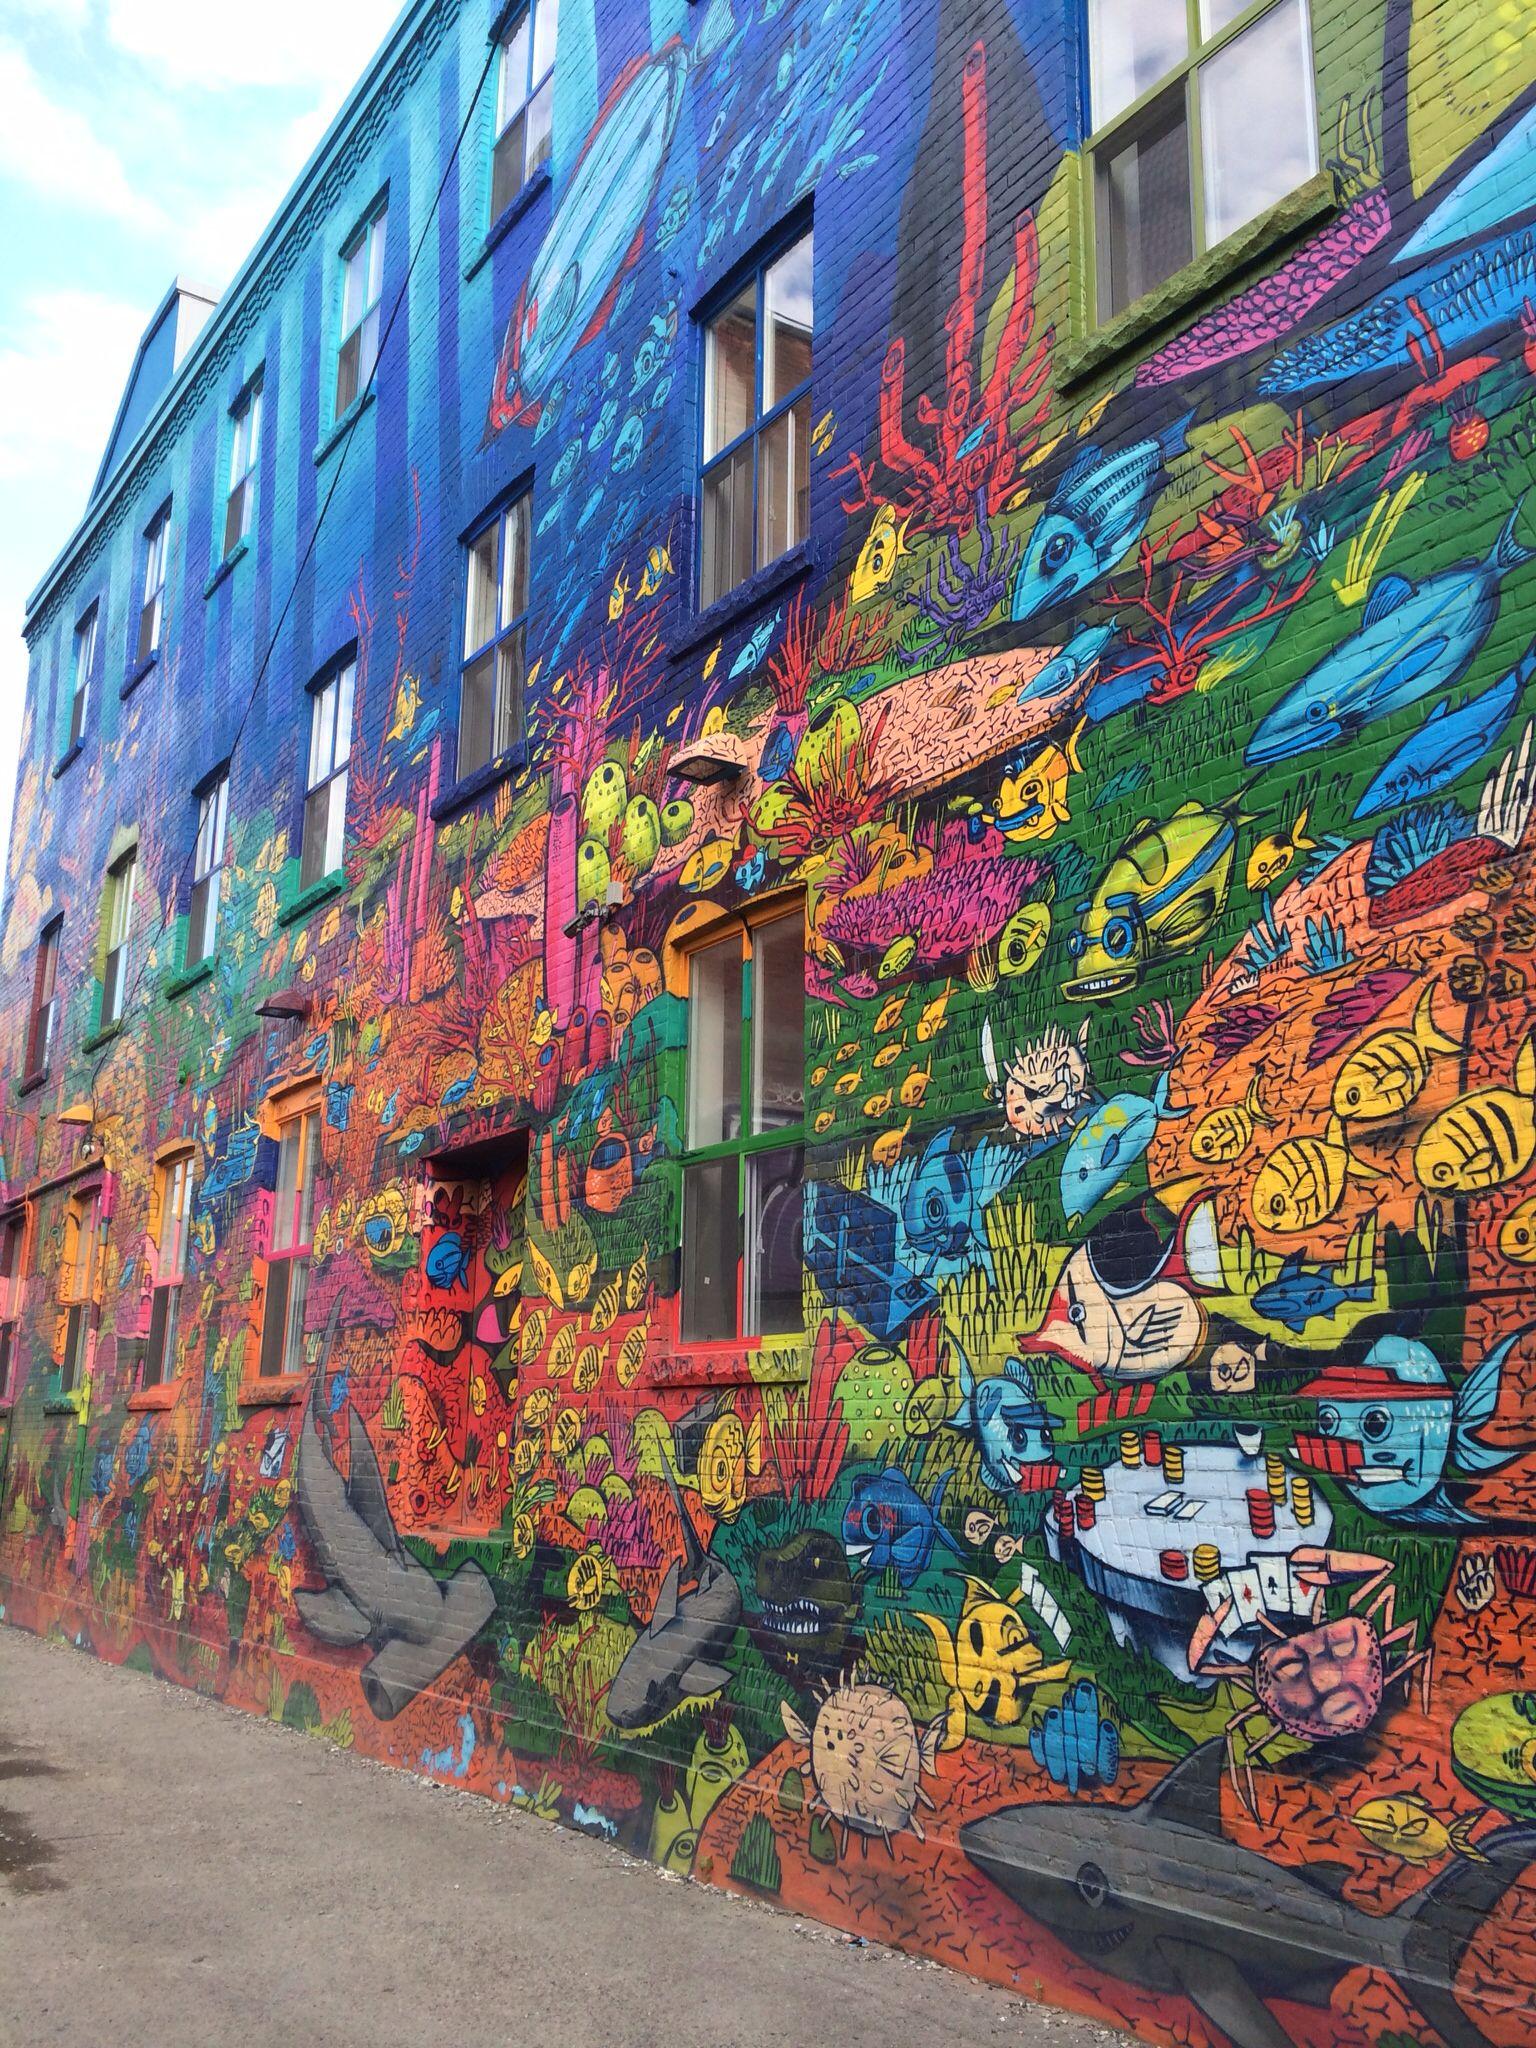 Graffiti alley toronto canada street art street art